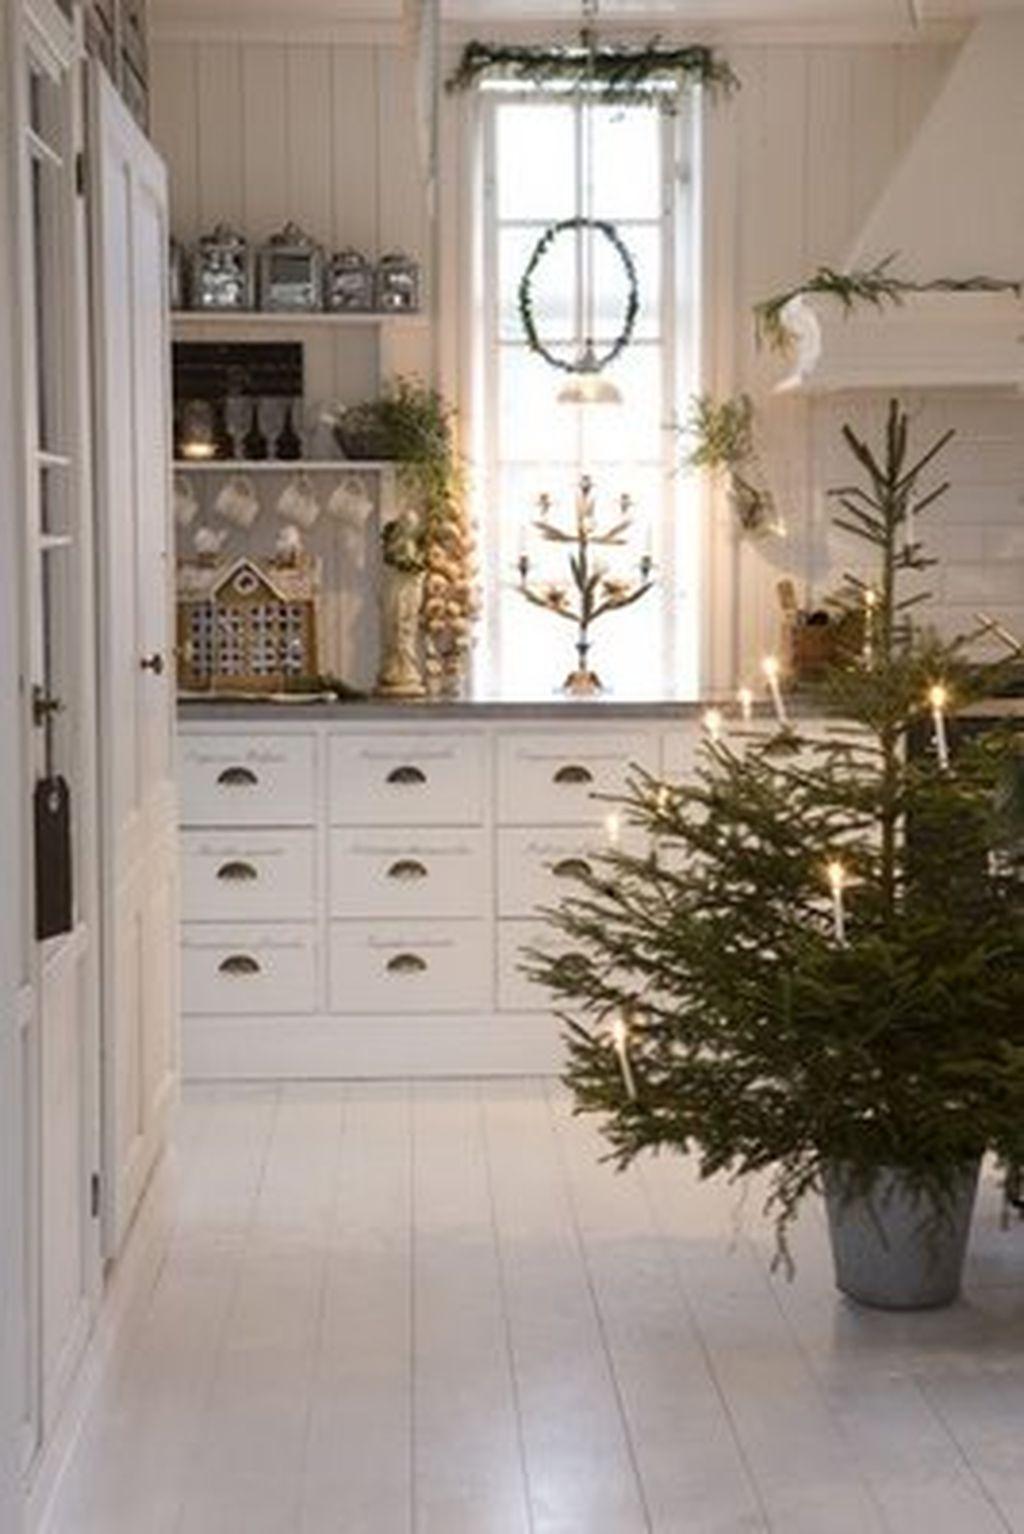 Adorable Rustic Christmas Kitchen Decoration Ideas 30